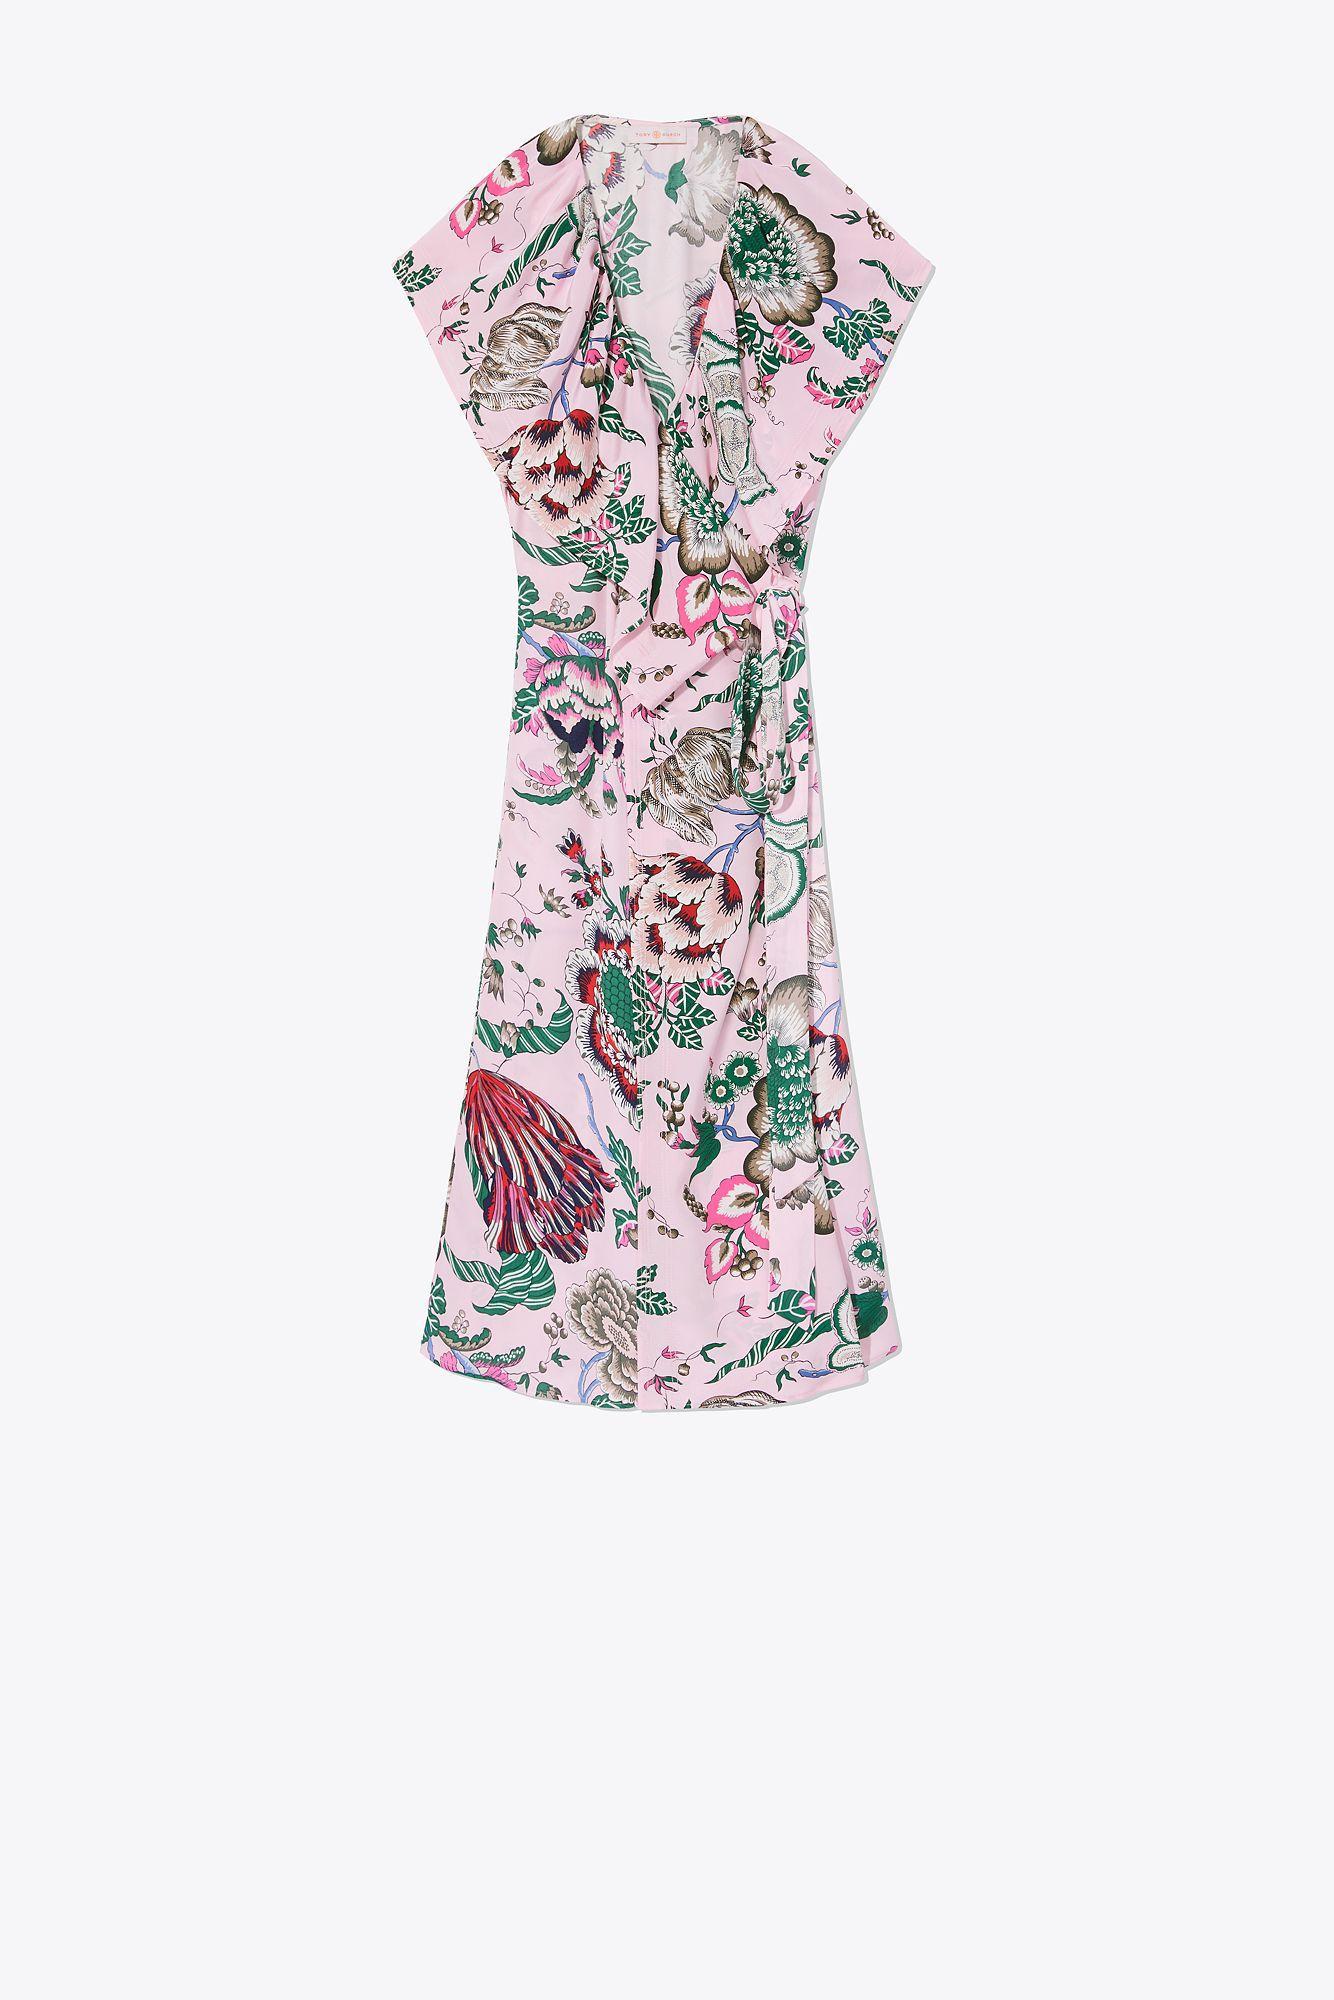 48b921f402c Tory Burch Adelia Dress